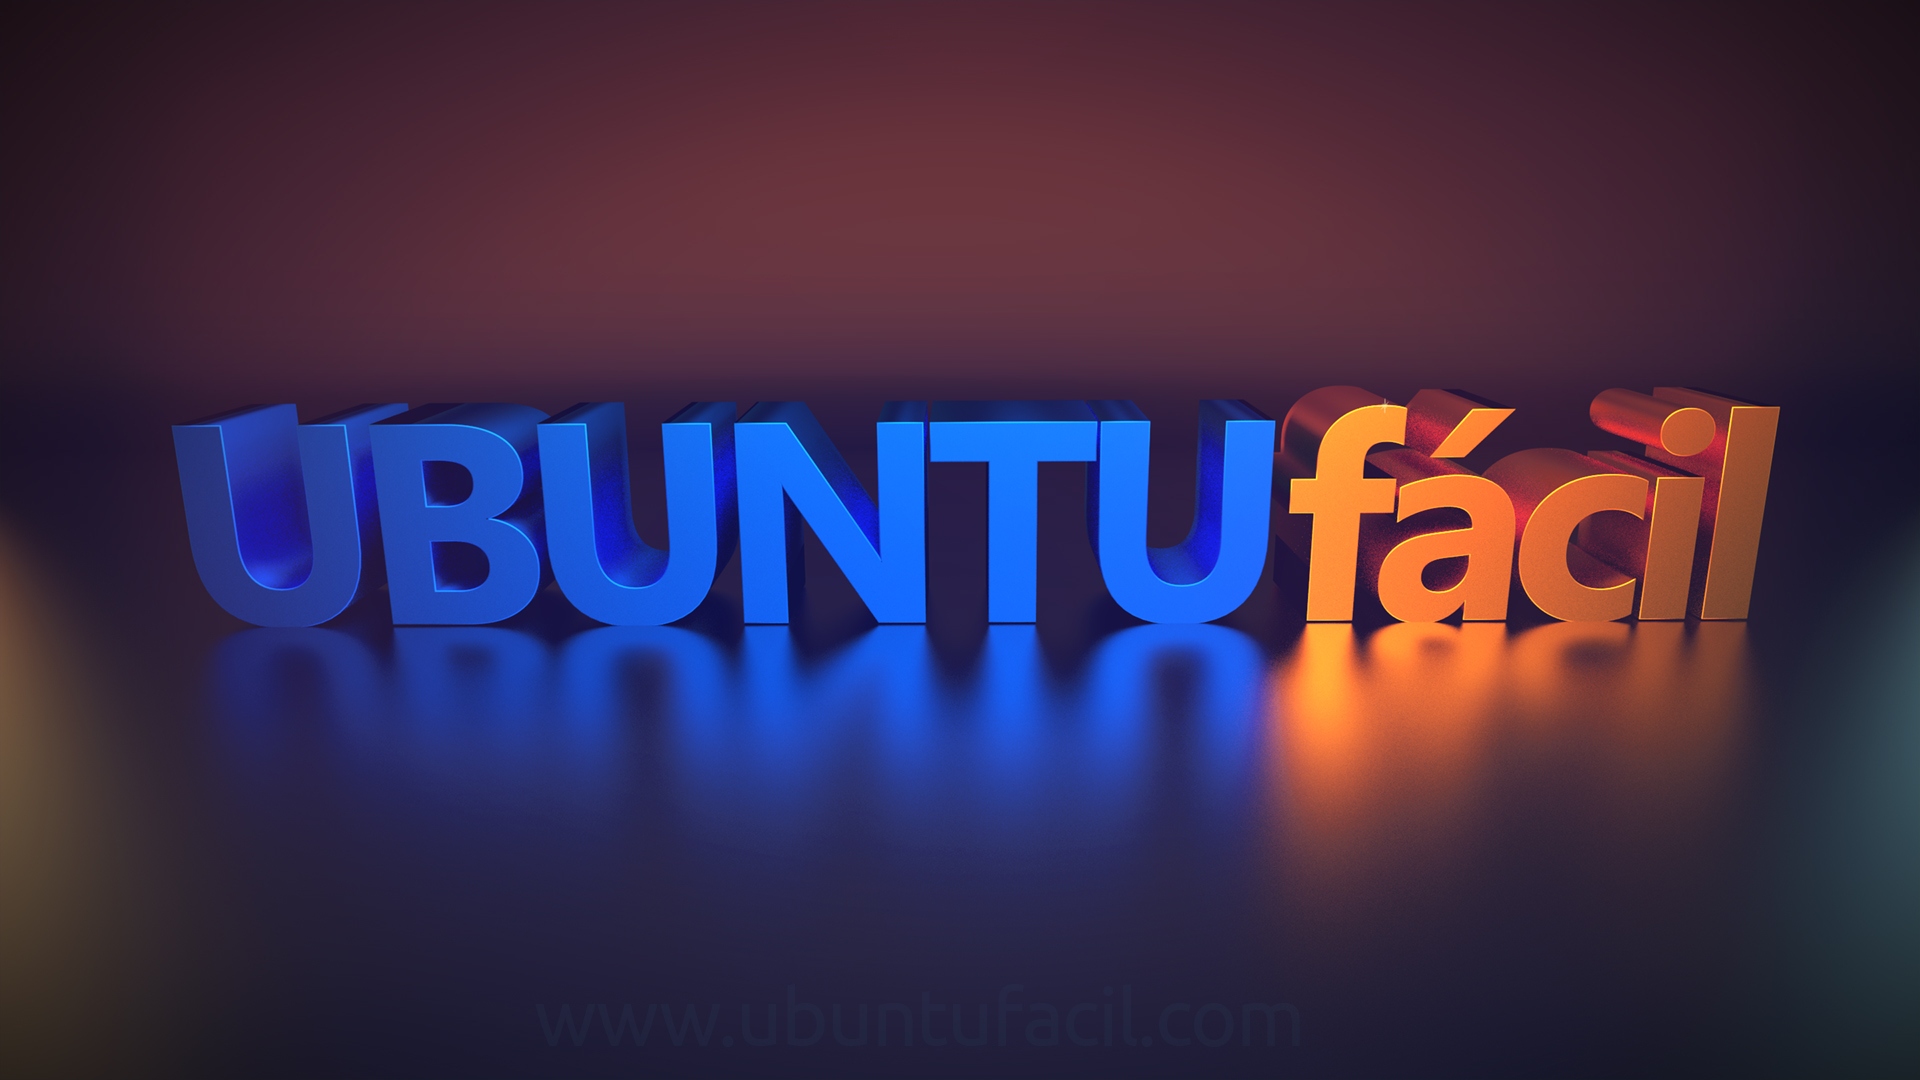 ubuntu-facil-blender-wallpaper-1080p-4